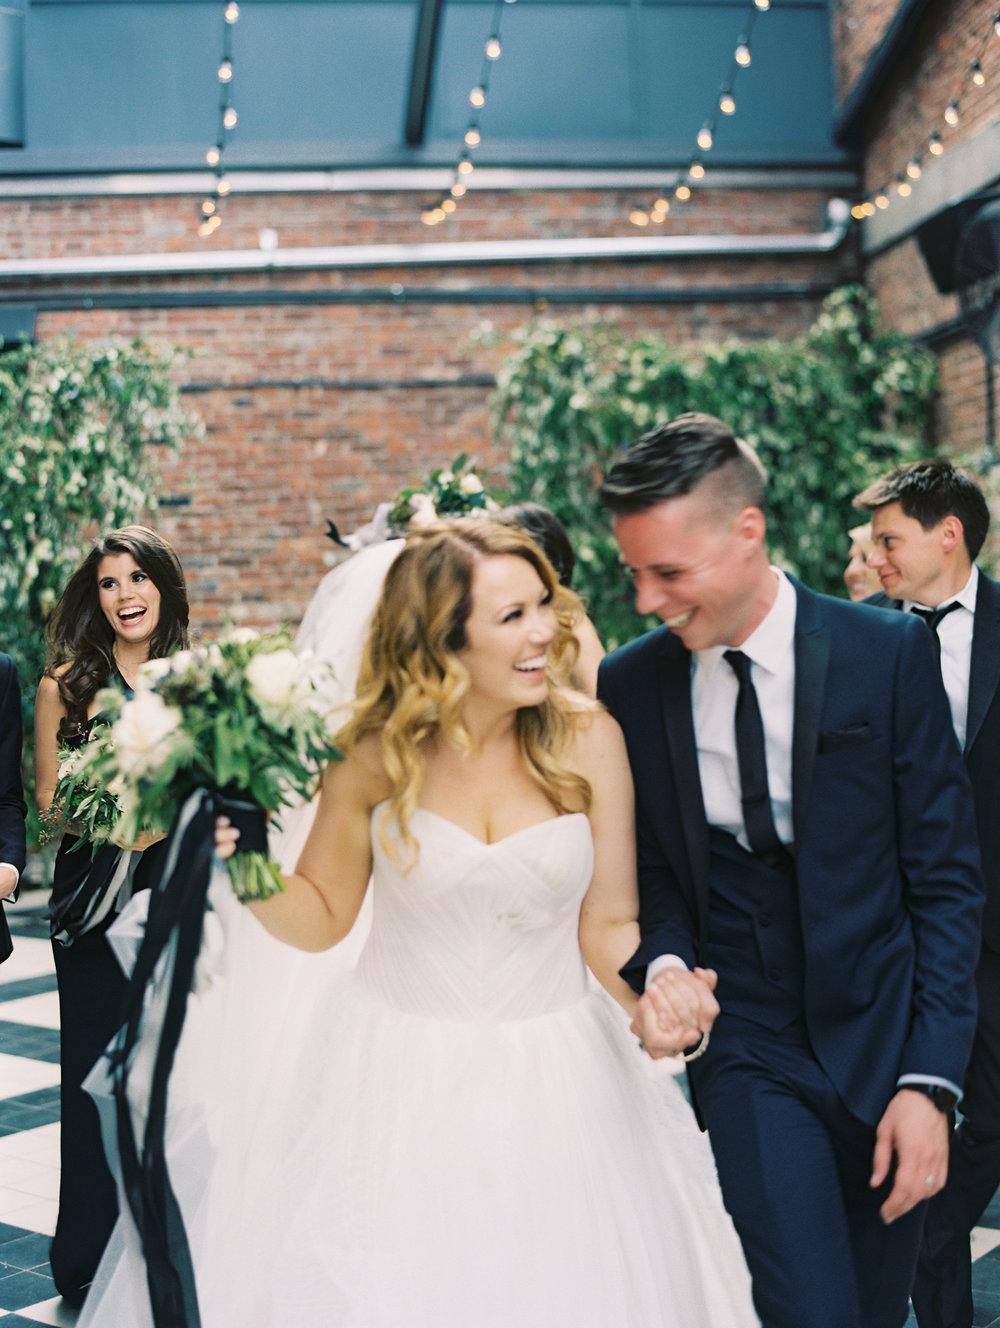 05_Bridal Party-0605.jpg